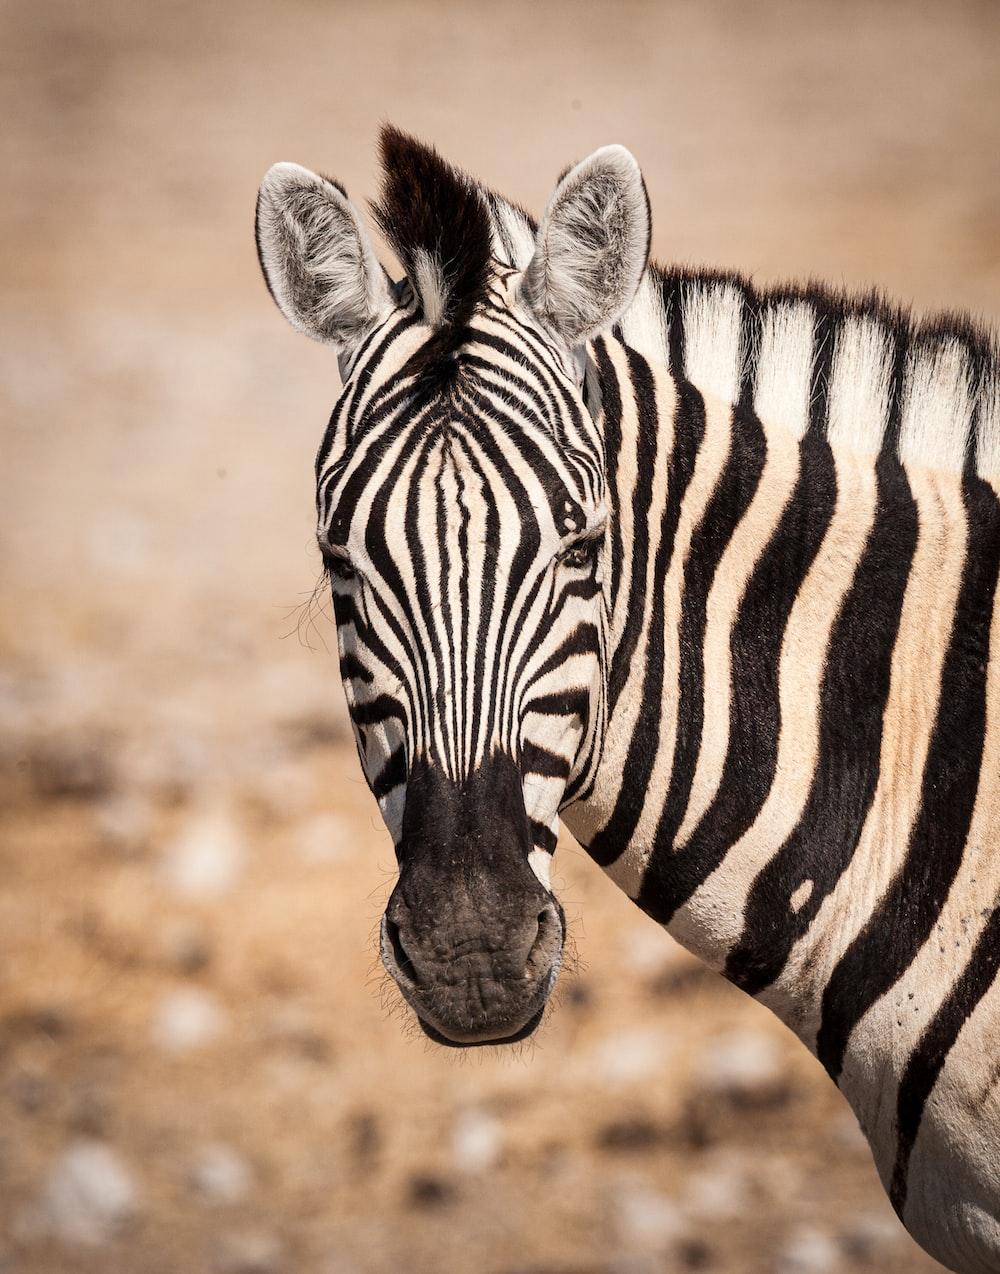 zebra in brown field during daytime